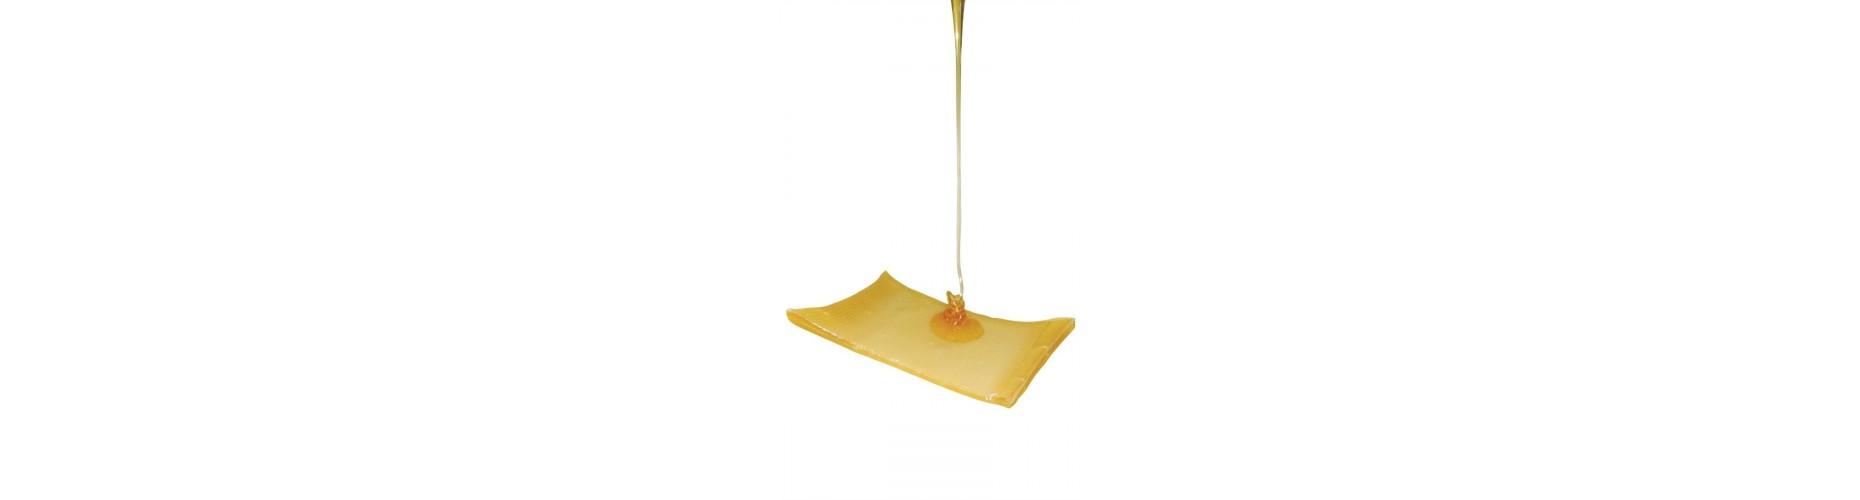 Medicazioni al miele di Manuka - Visiocare - Vendita Online